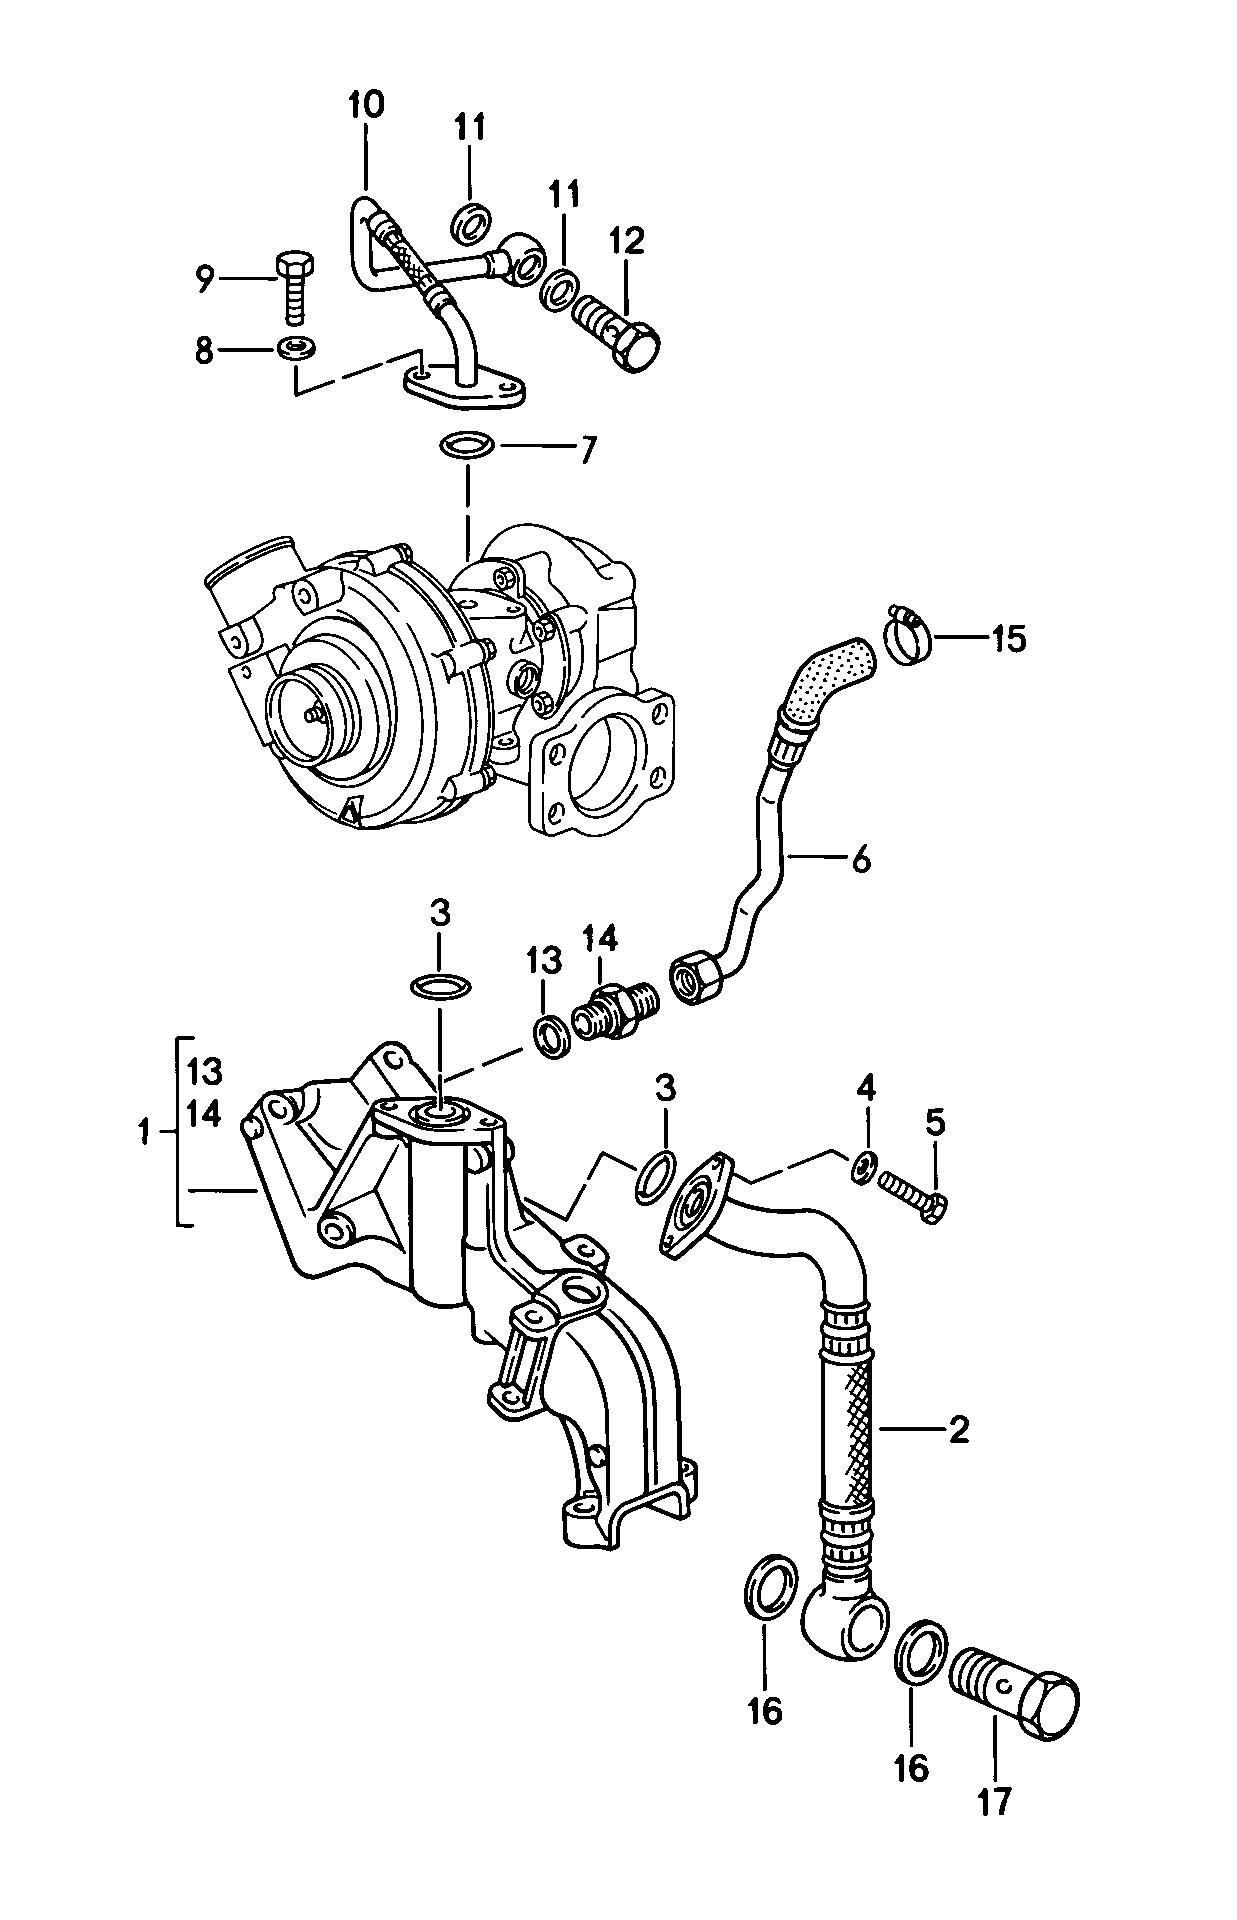 Porsche 944 Dme Wiring Diagram - Wiring Diagrams Dock